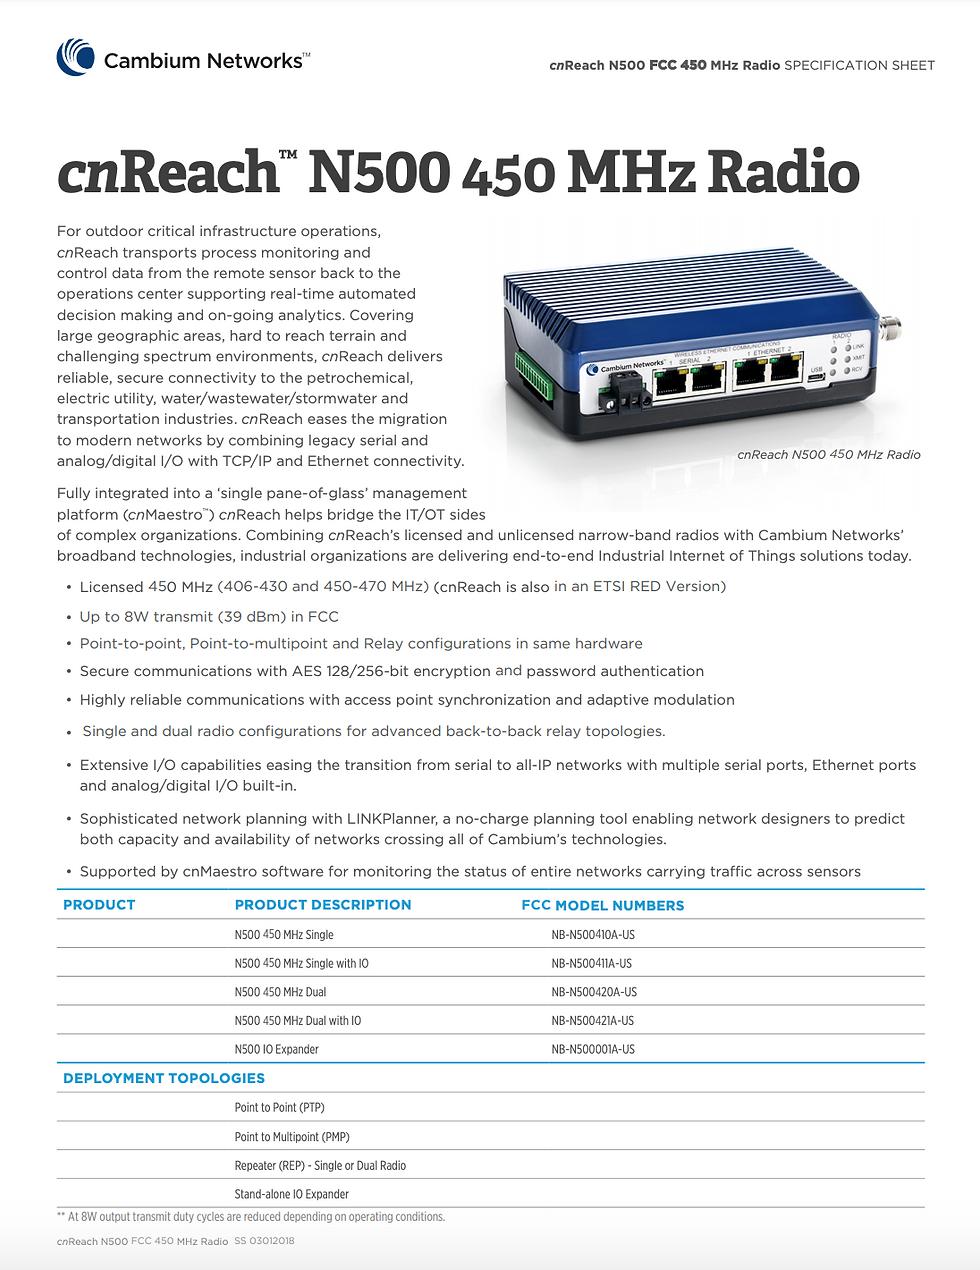 cnReach N500 450 MHz FCC Specifications Sheet